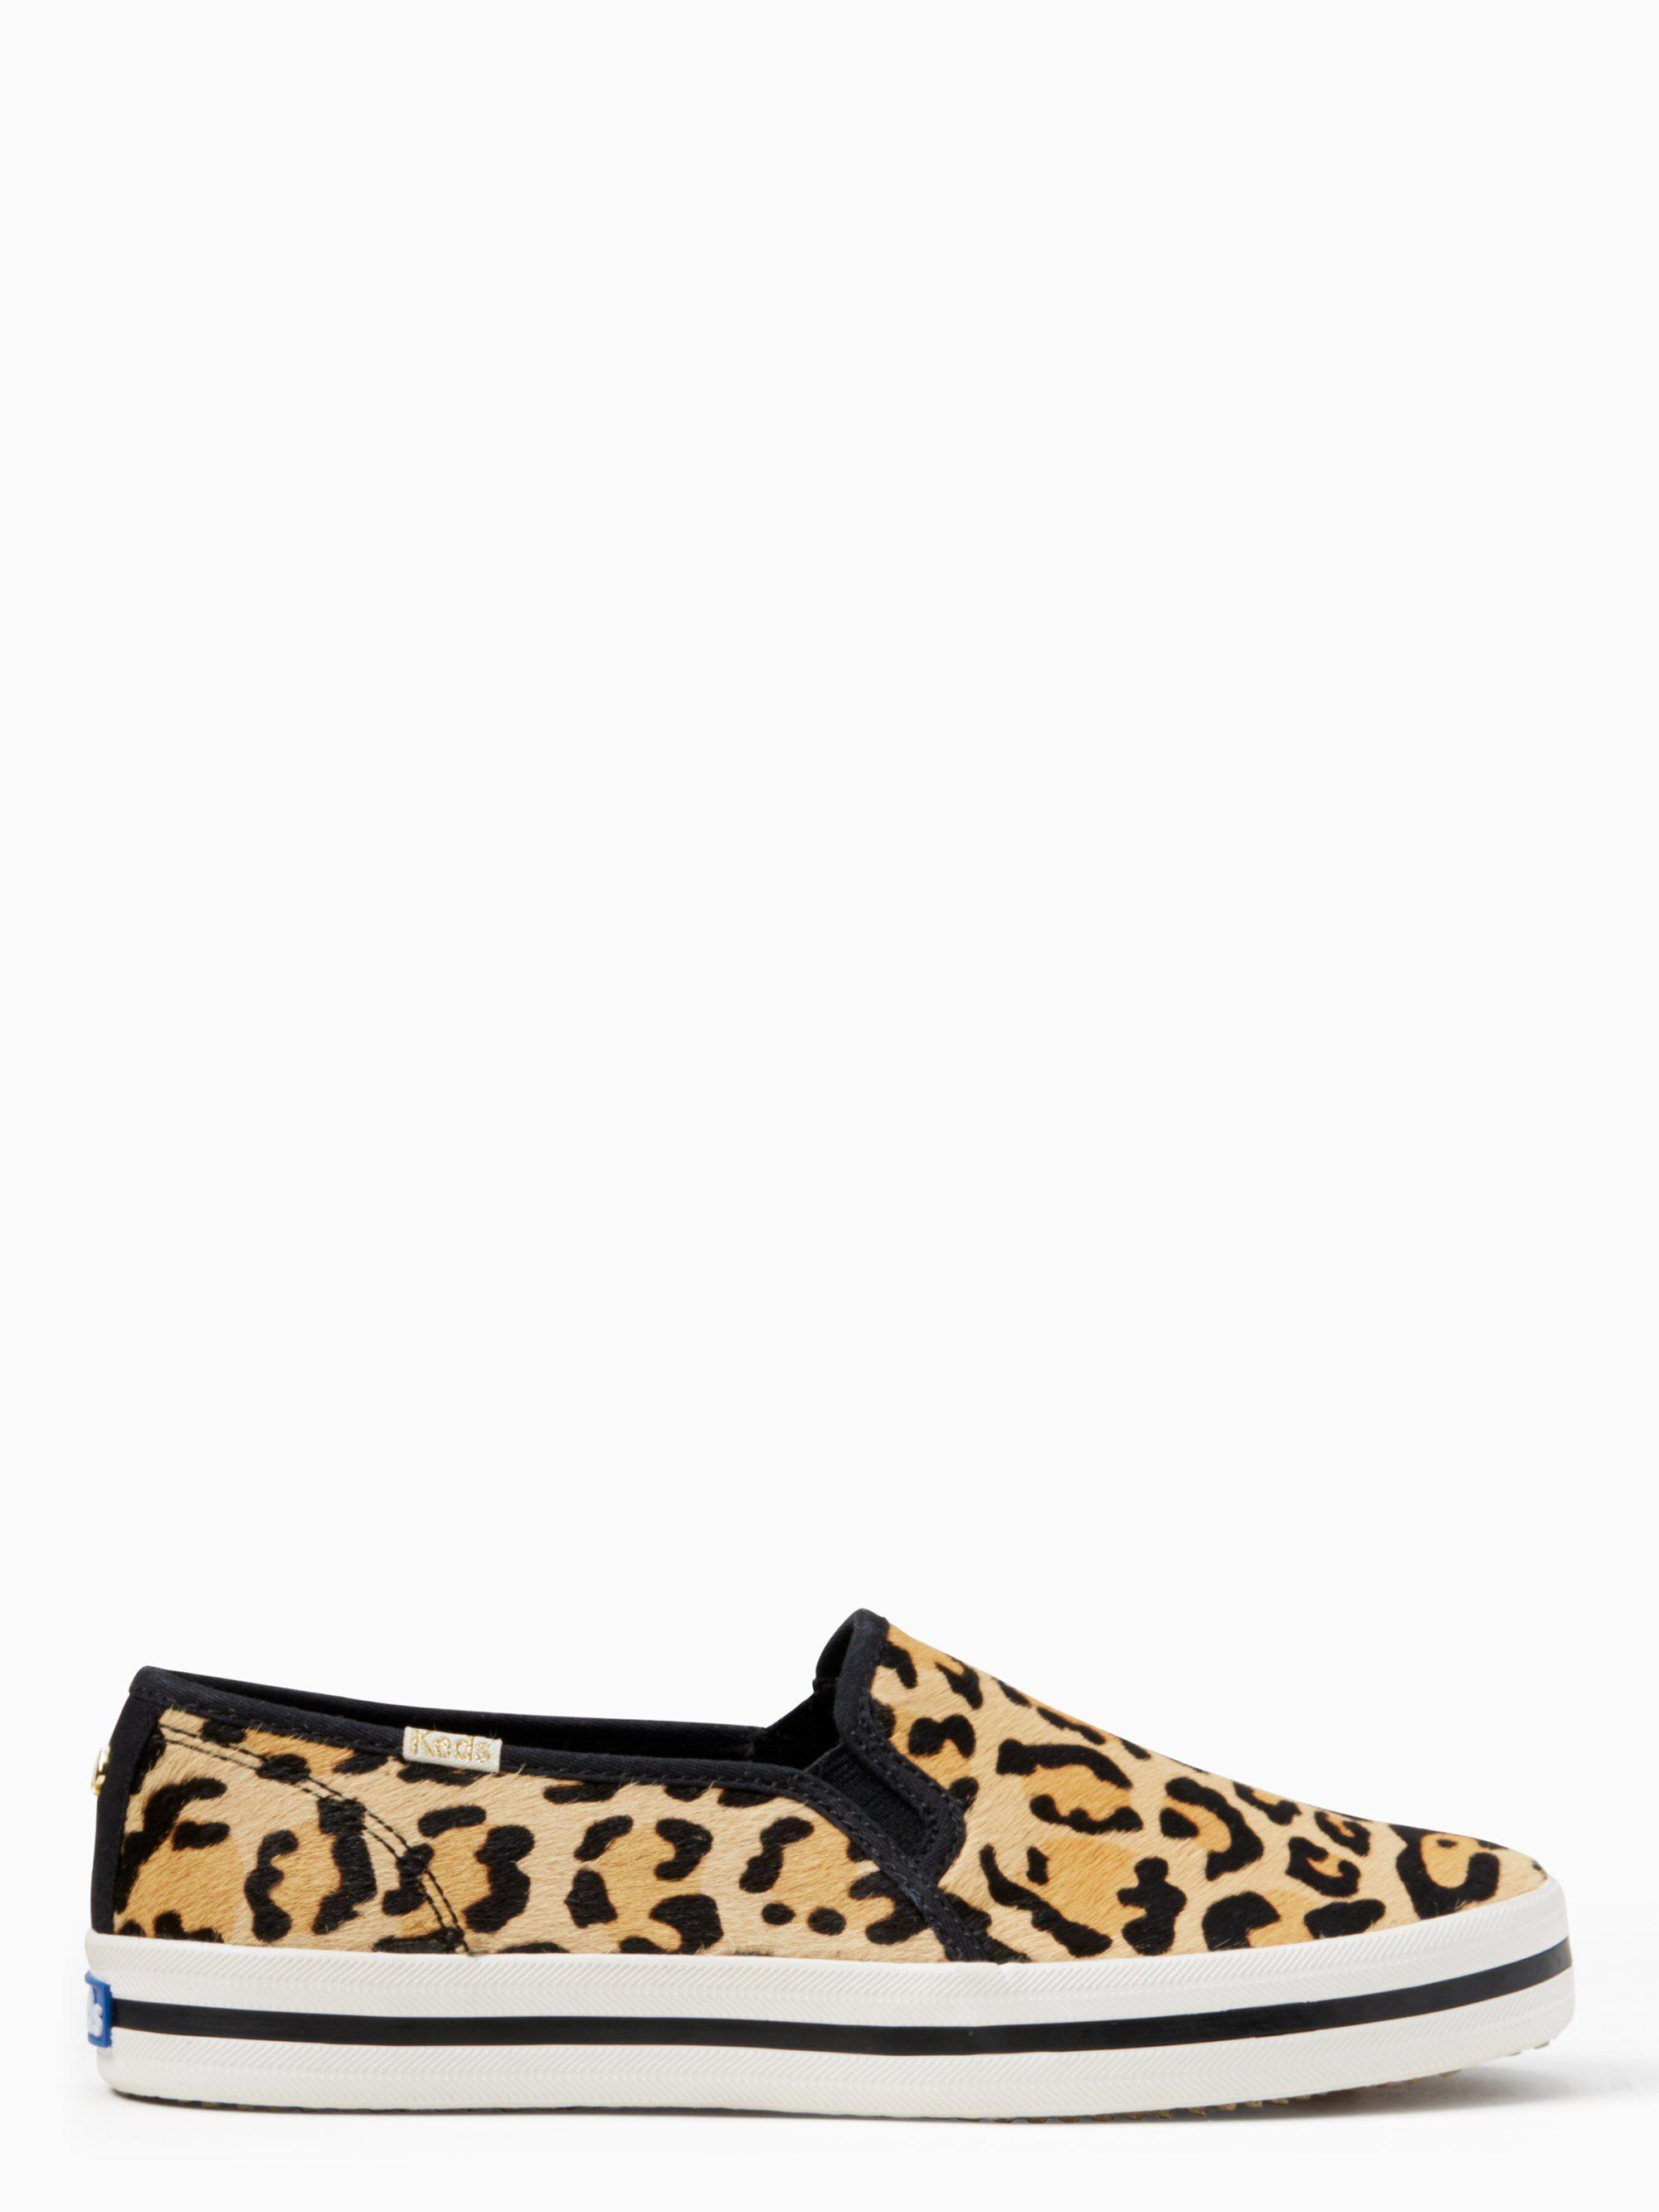 865d3bf7a07e Lyst - Kate Spade Keds X New York Double Decker Leopard-print Sneakers